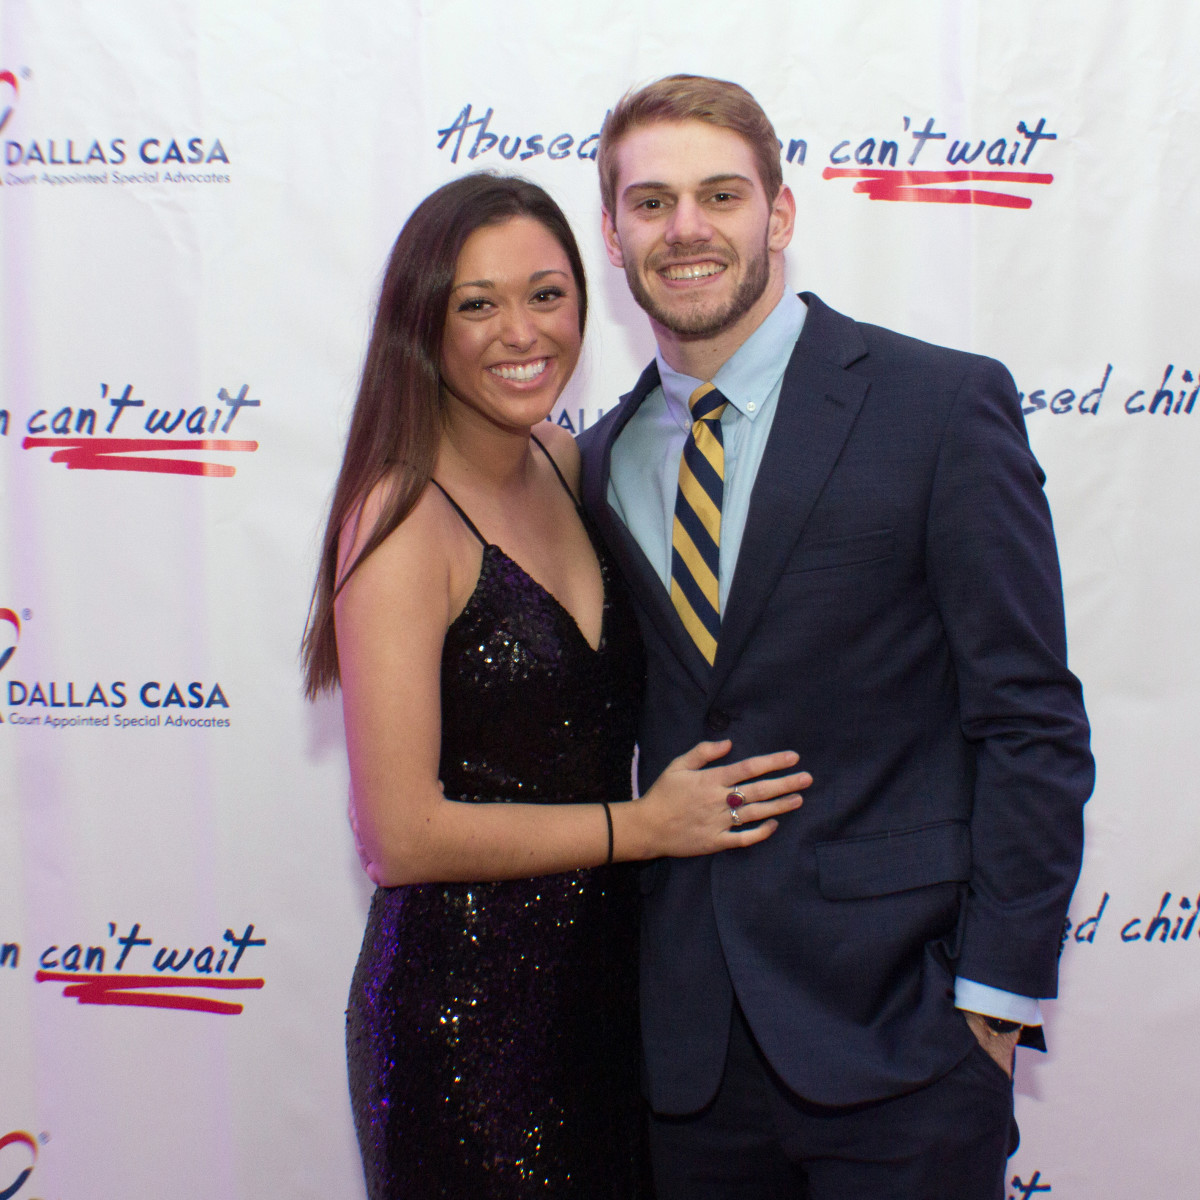 Dallas, CASAblanca gala, January 2018, Nick Berman, Julia Spendio